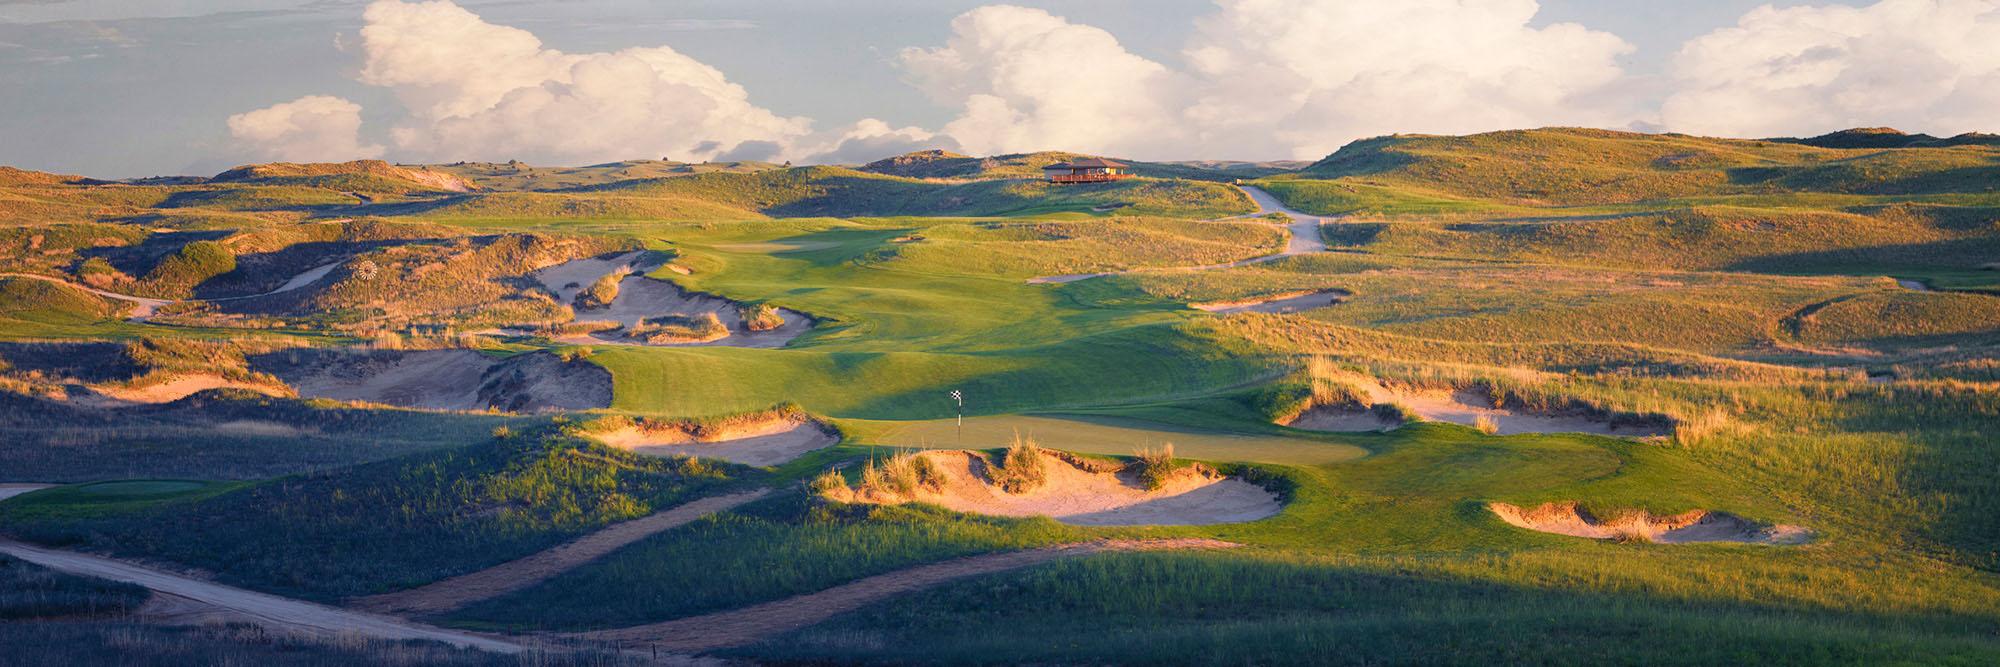 Golf Course Image - Sand Hills No. 17